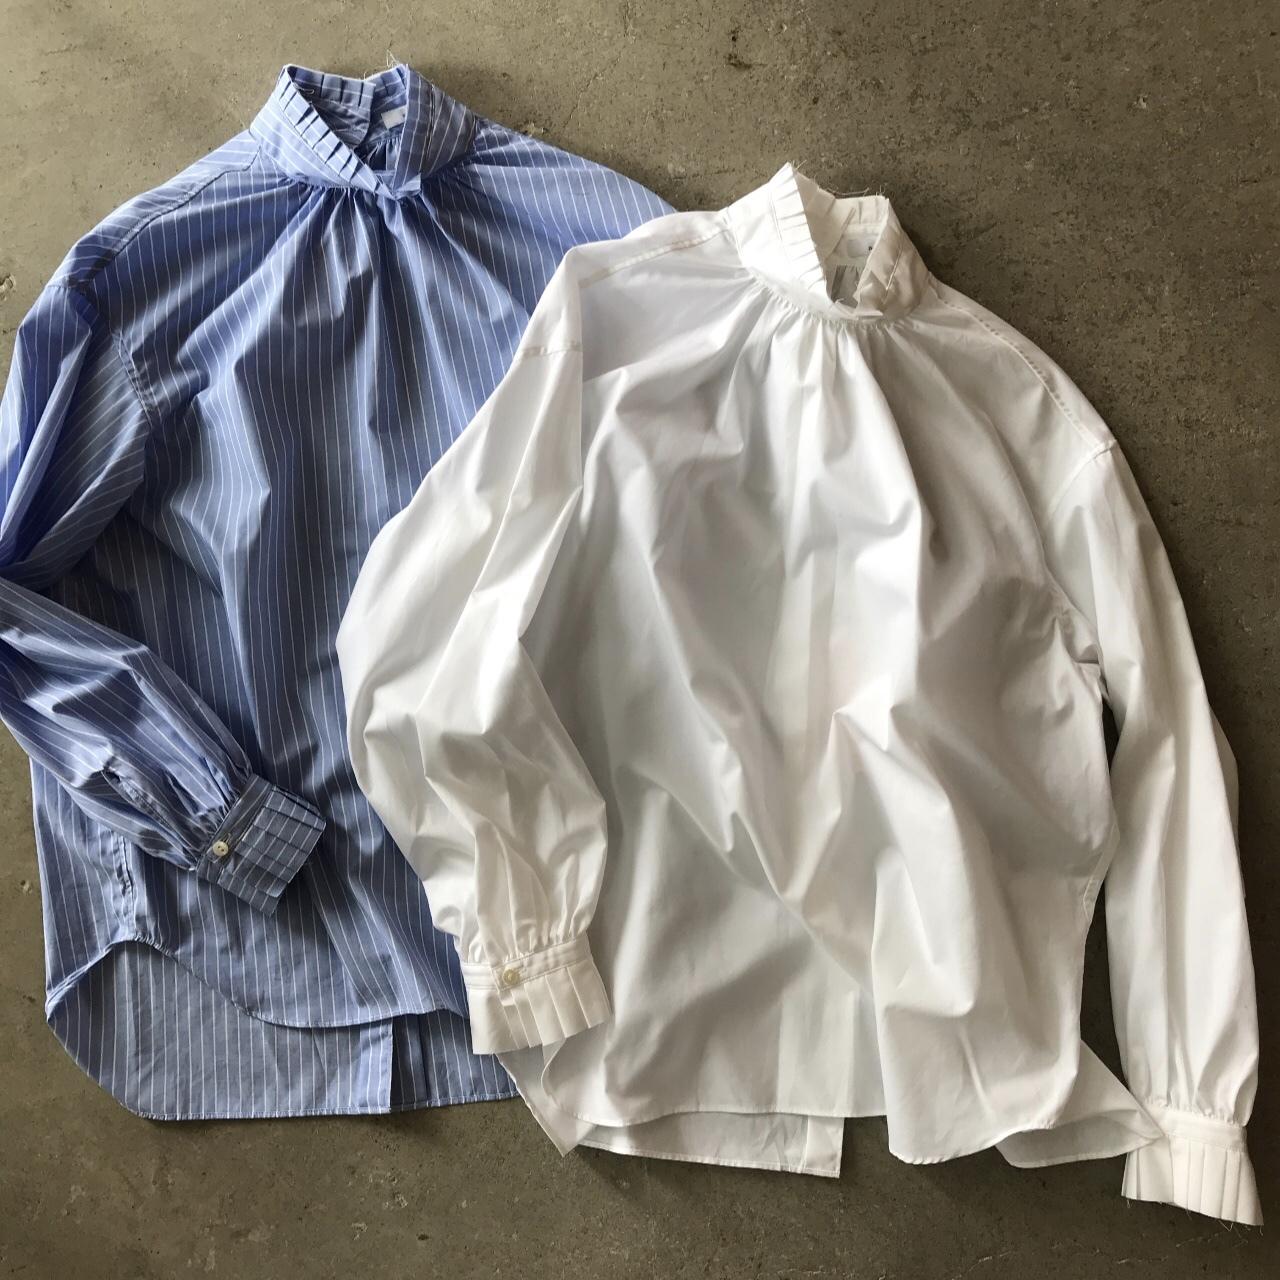 PHEENY - Stand collar frill tuck shirt